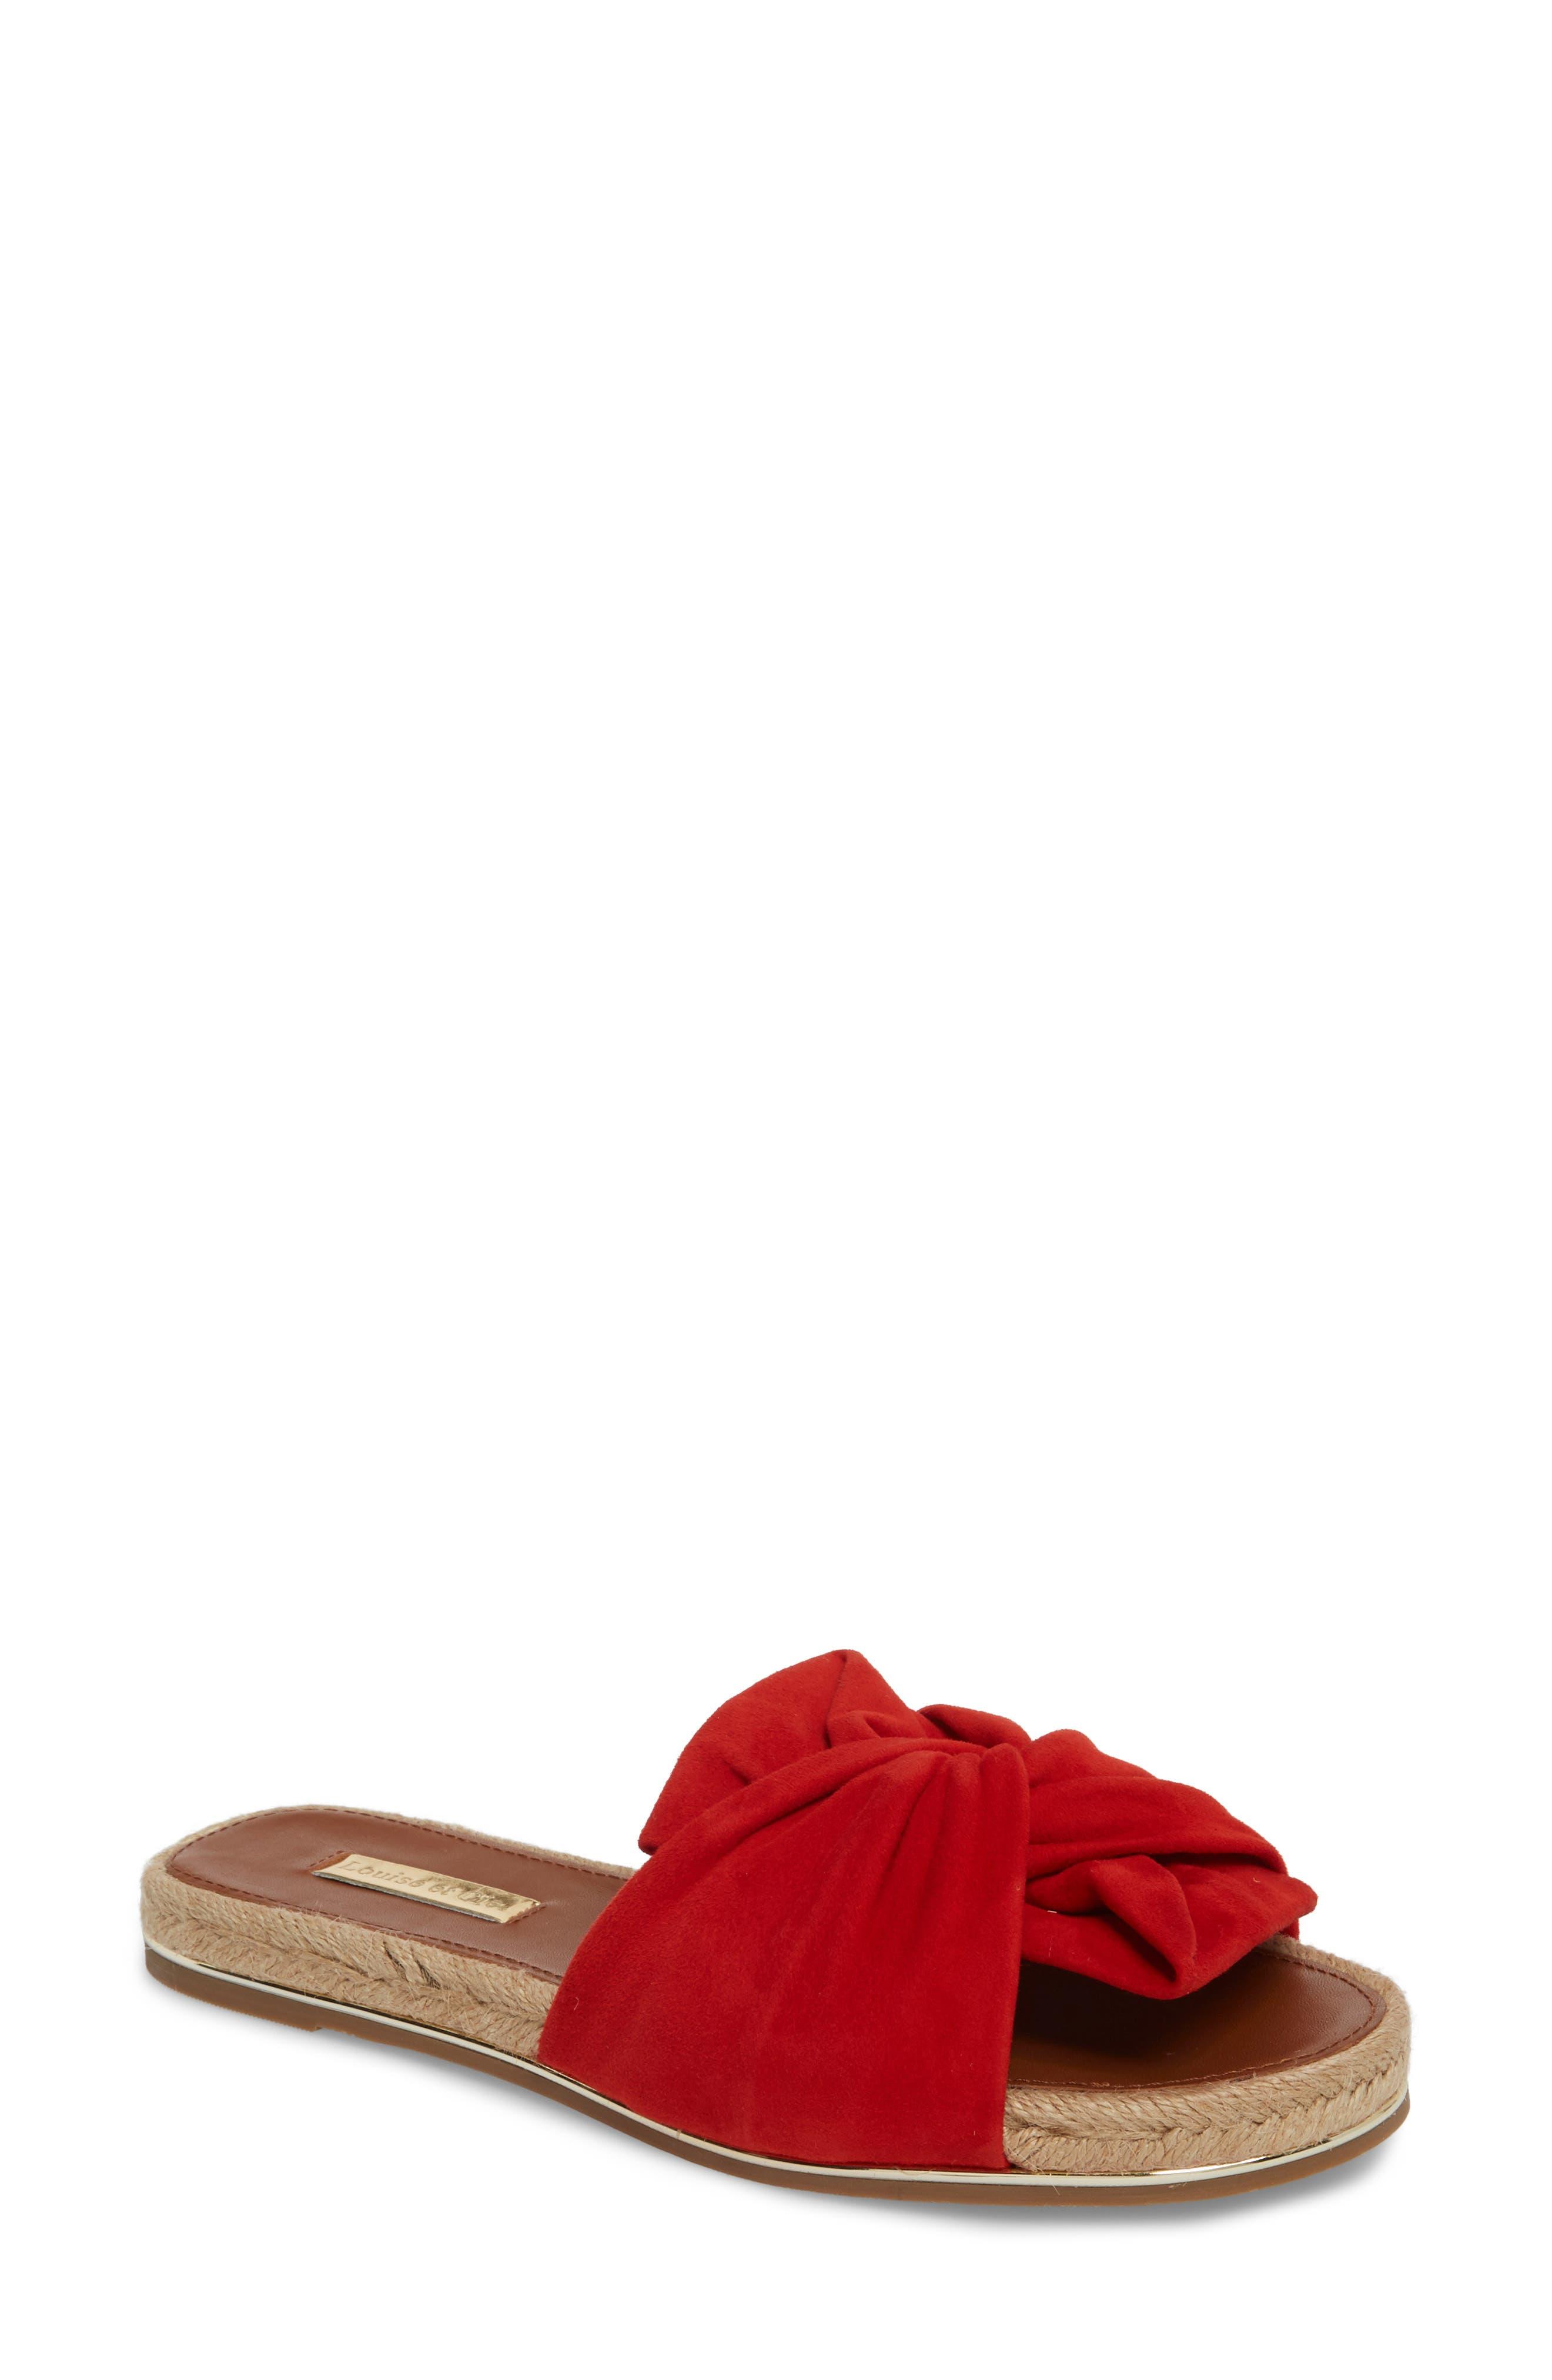 Louise Et Cie Camille Espadrille Slide Sandal- Red